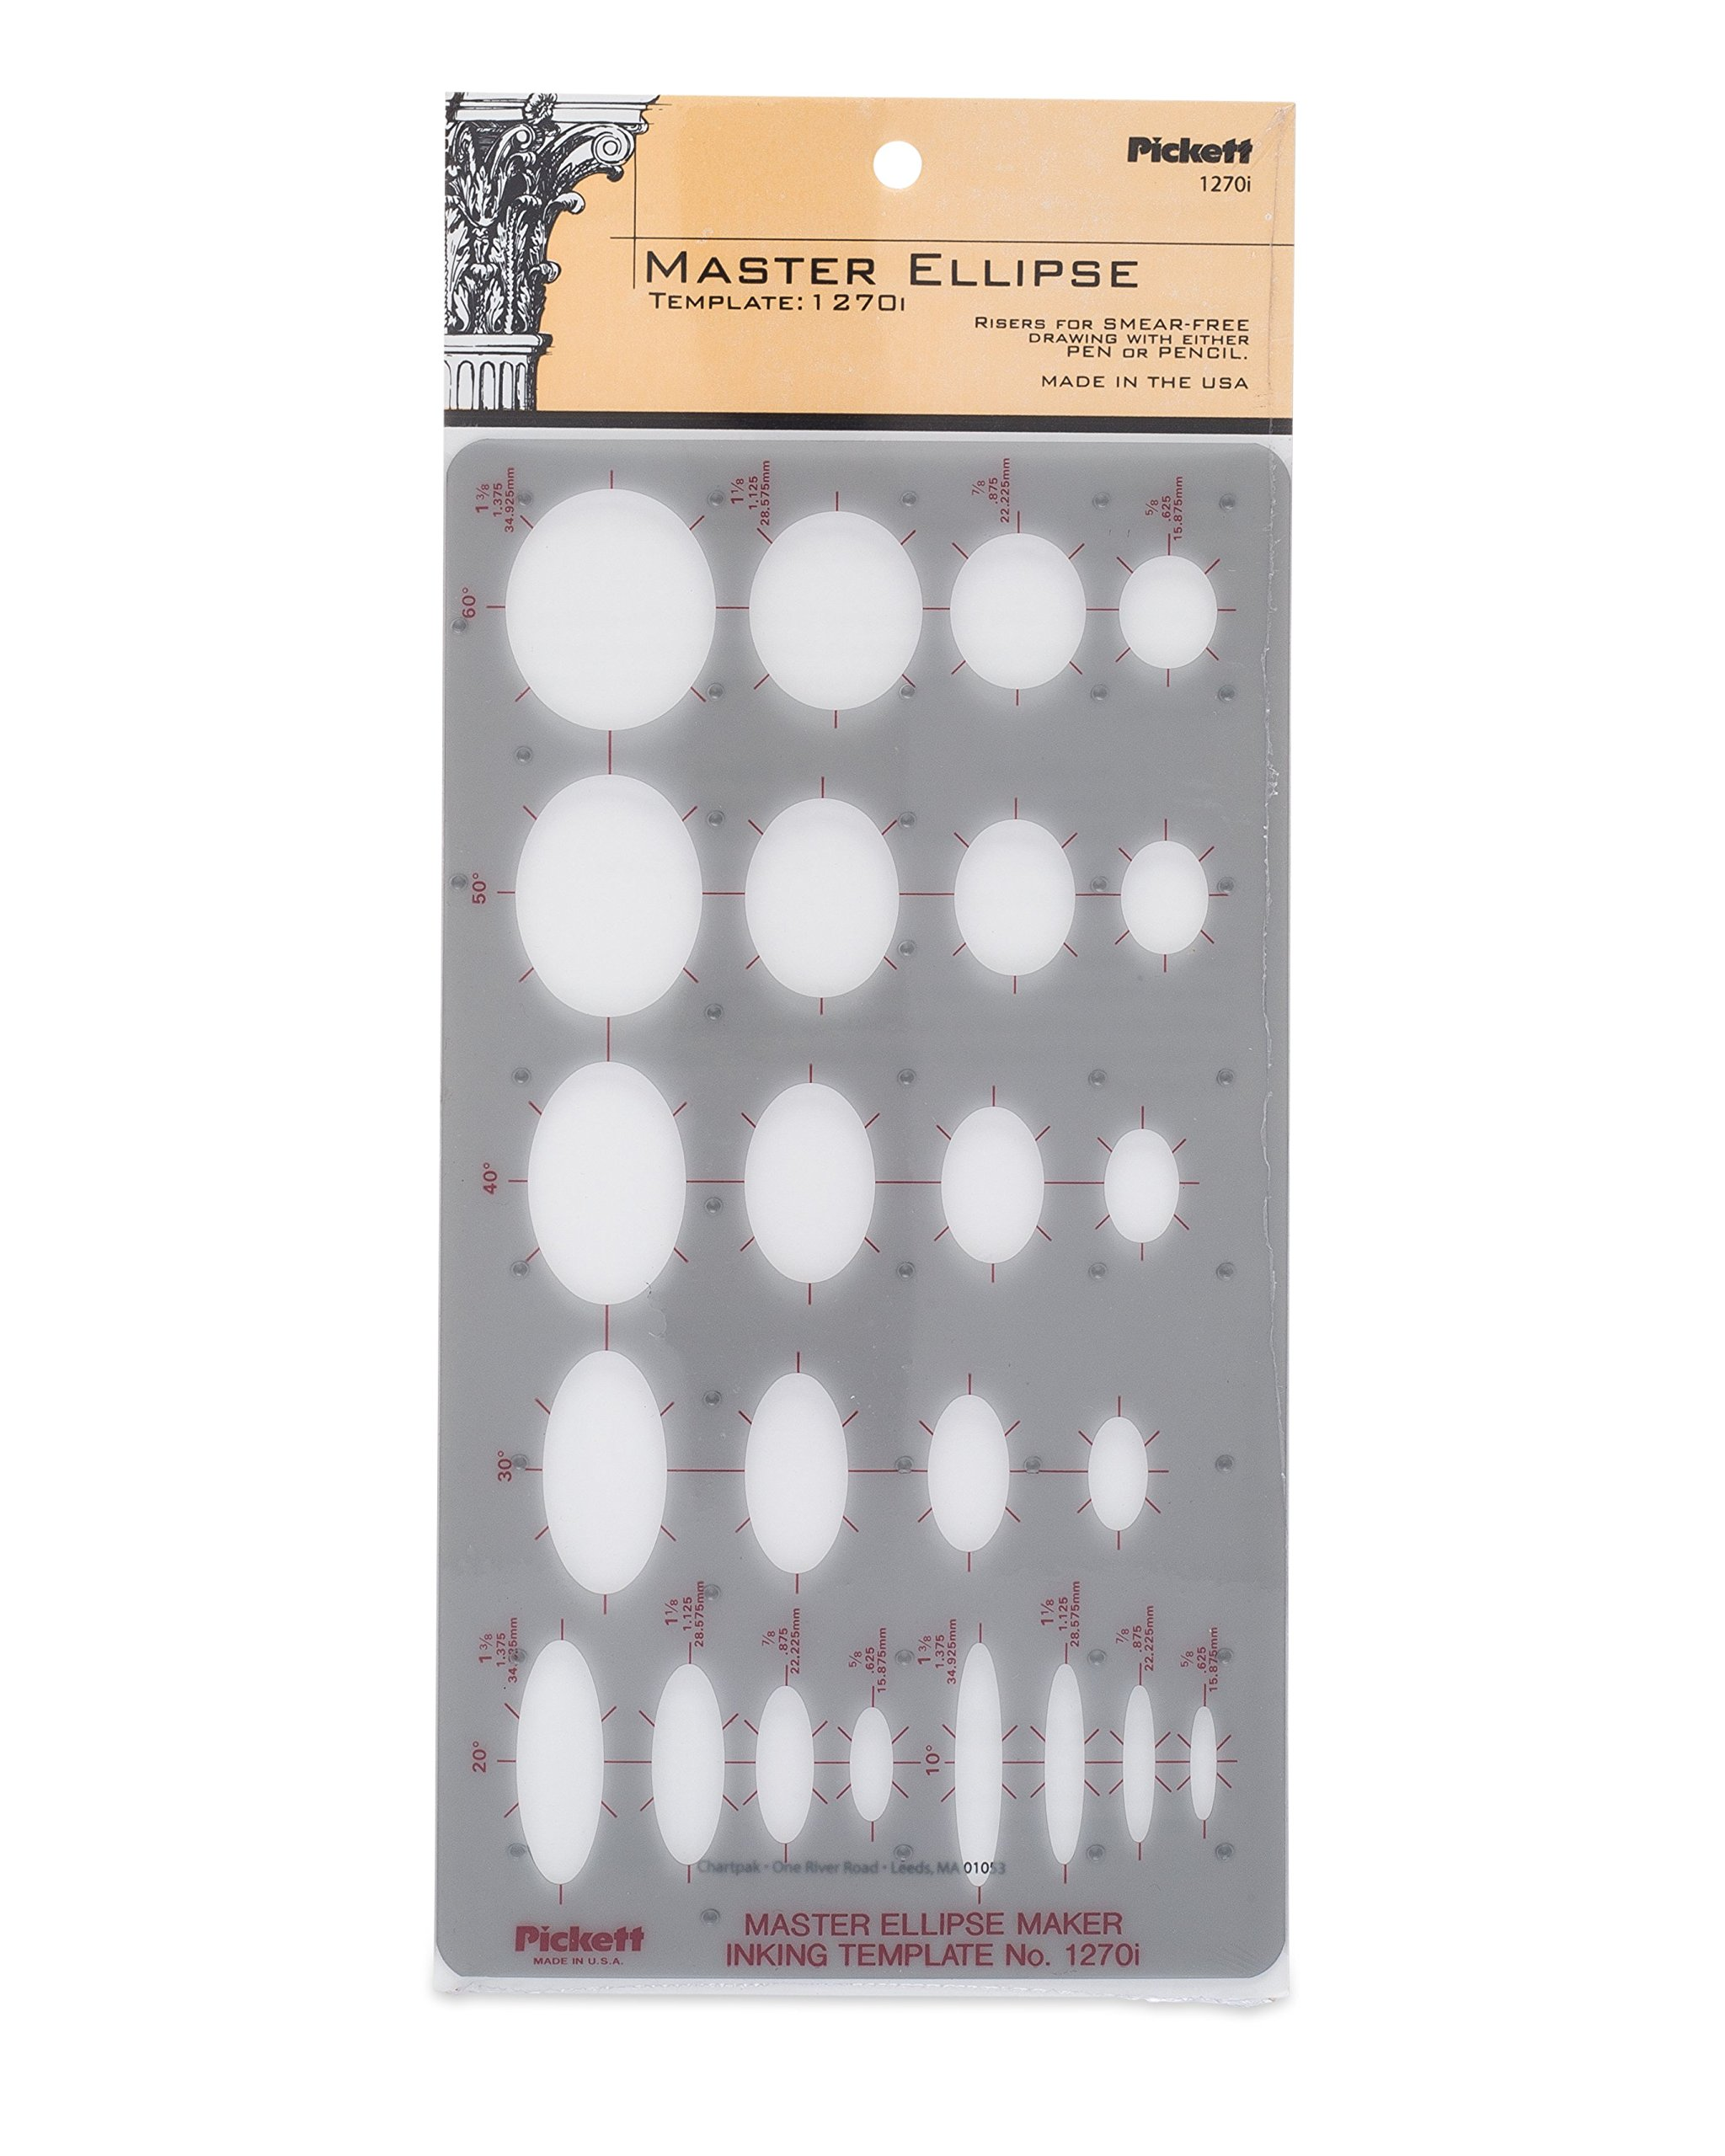 Pickett Master Ellipse Template (1270I)